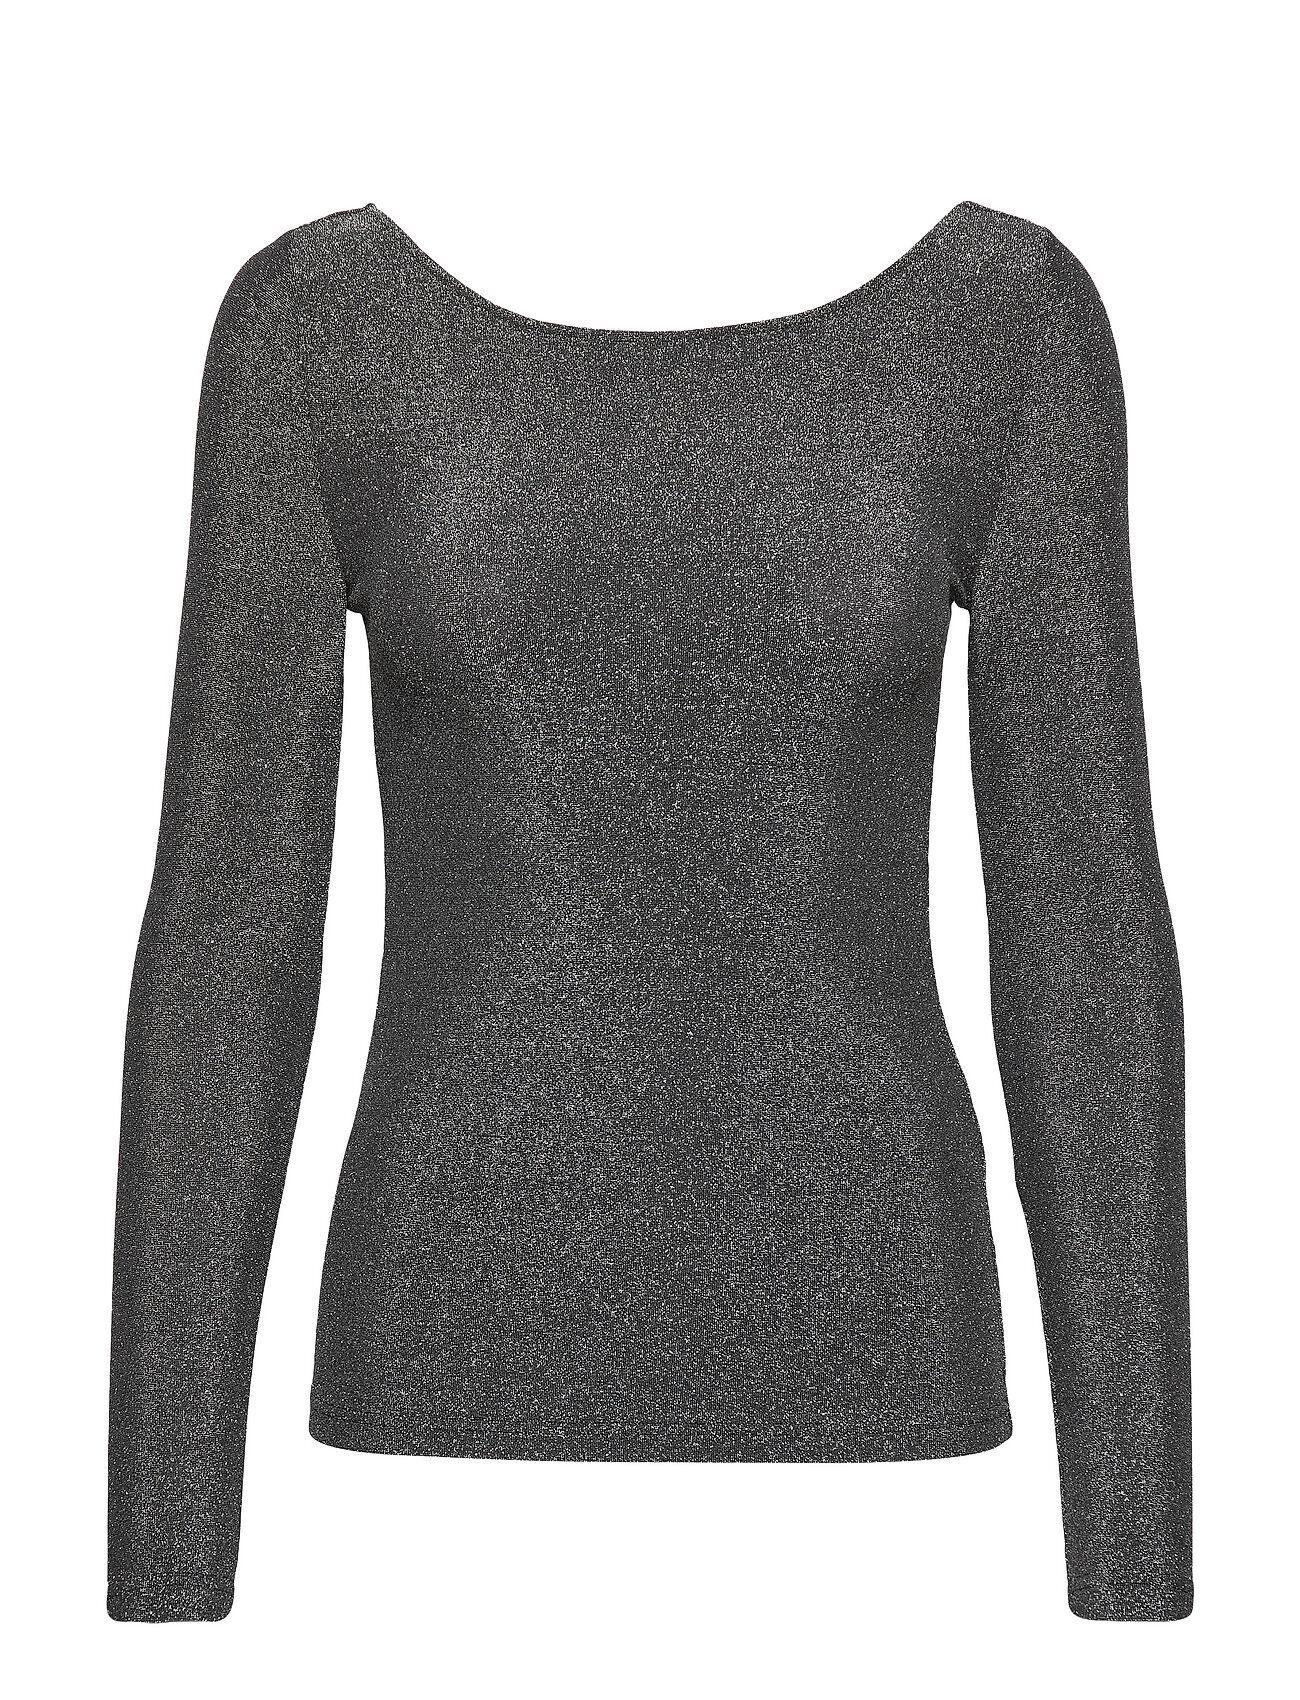 Soaked in Luxury Slskylara Top T-shirts & Tops Long-sleeved Harmaa Soaked In Luxury